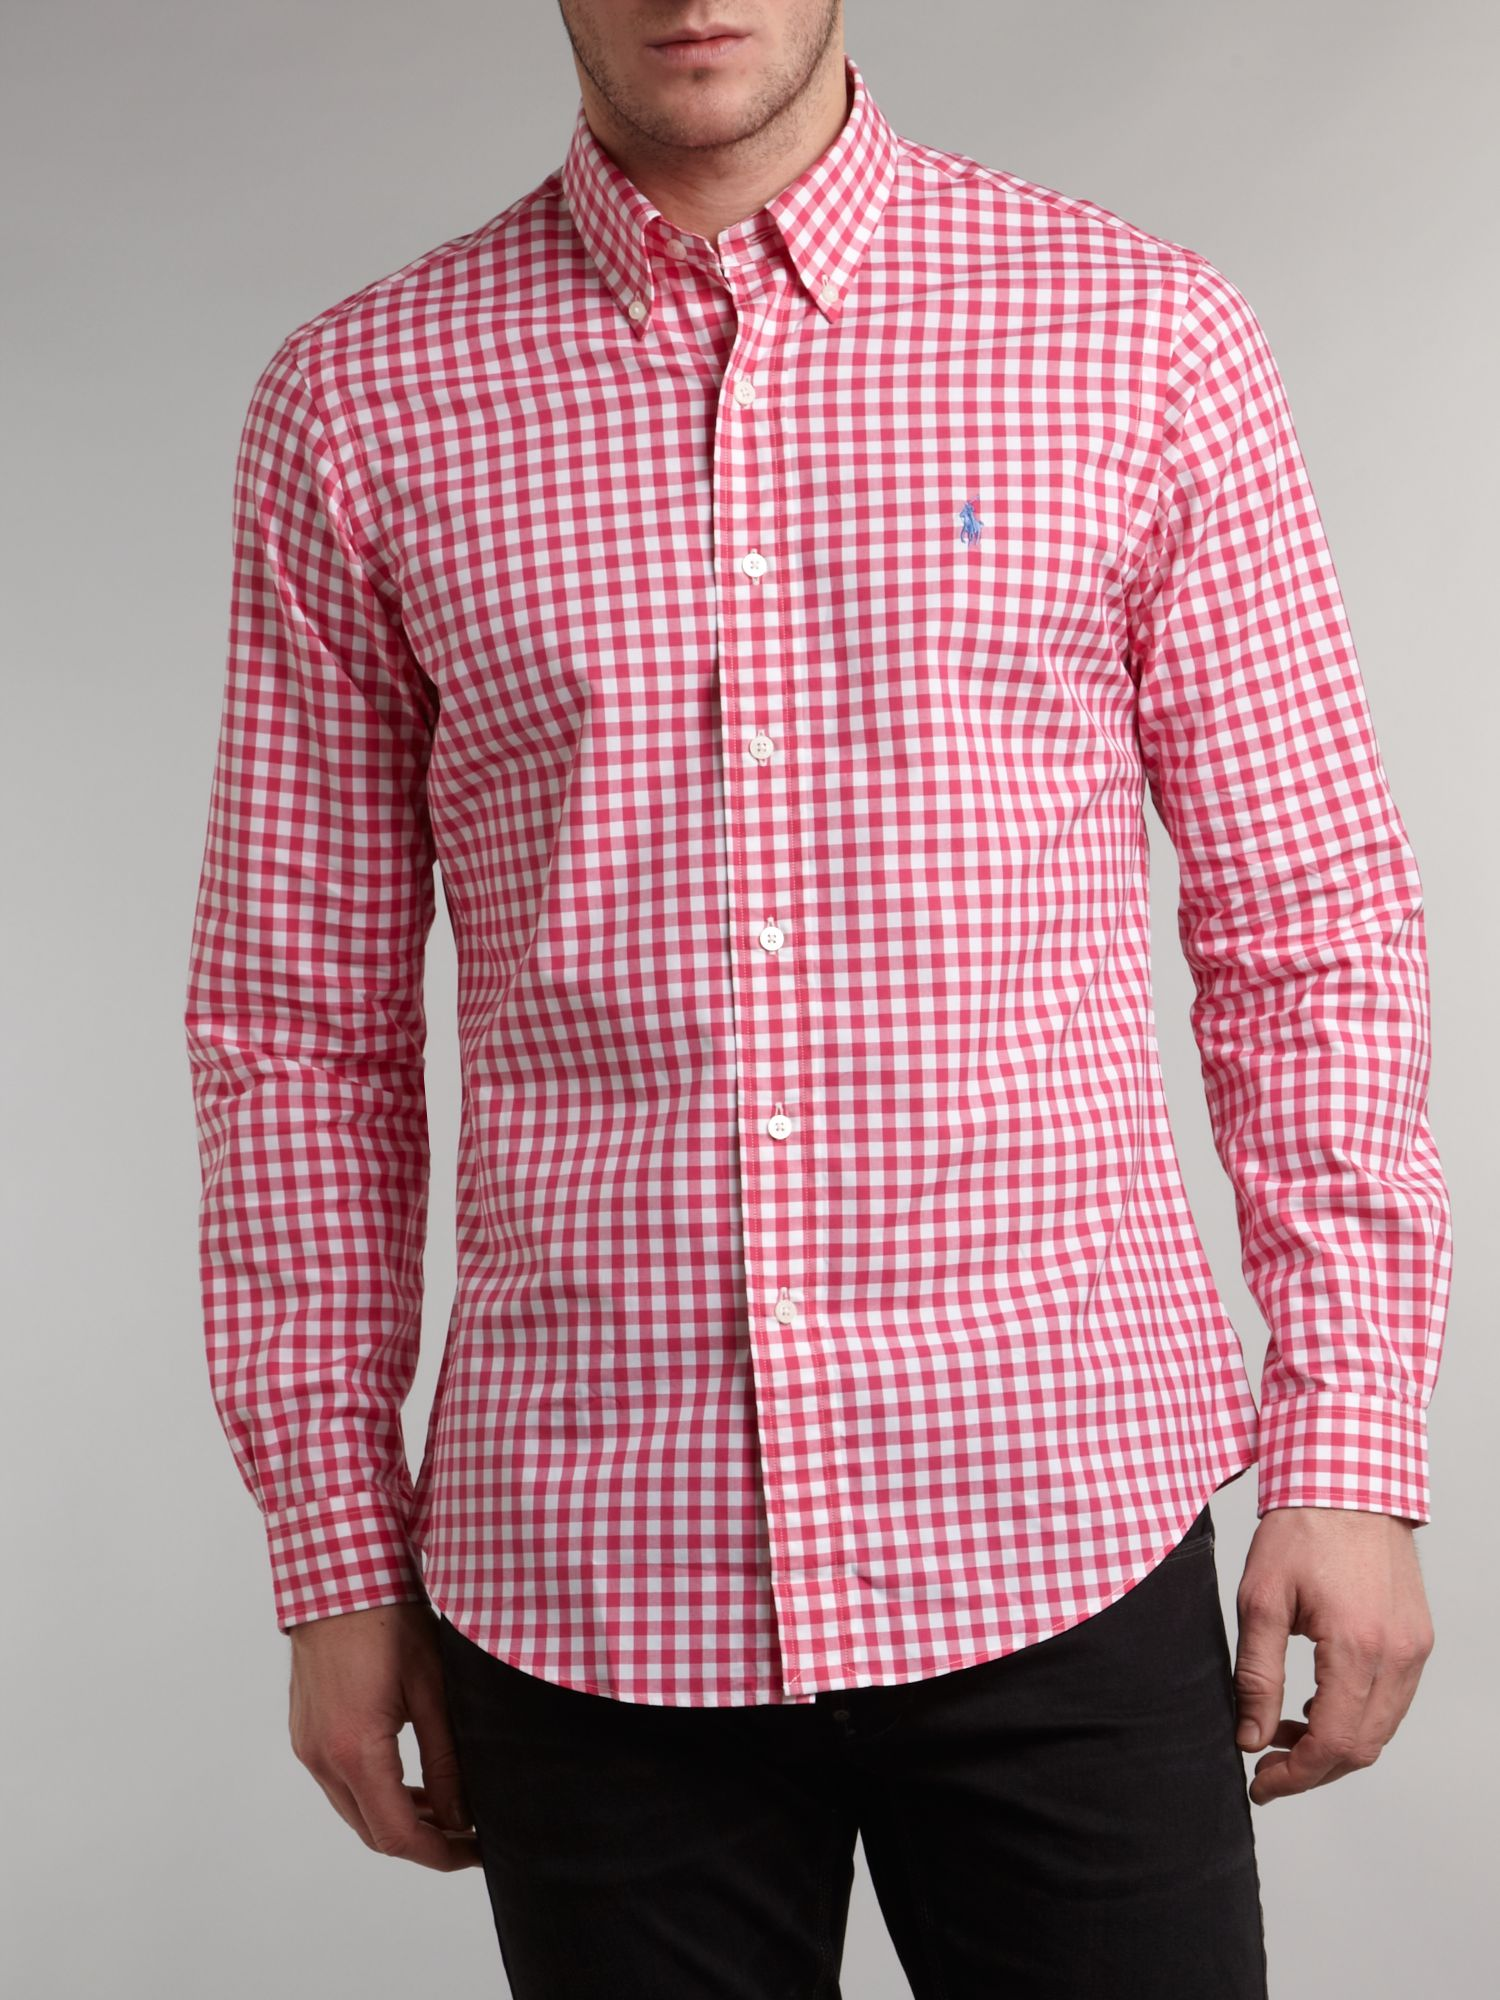 Men S Long Sleeved Polo Shirts Uk